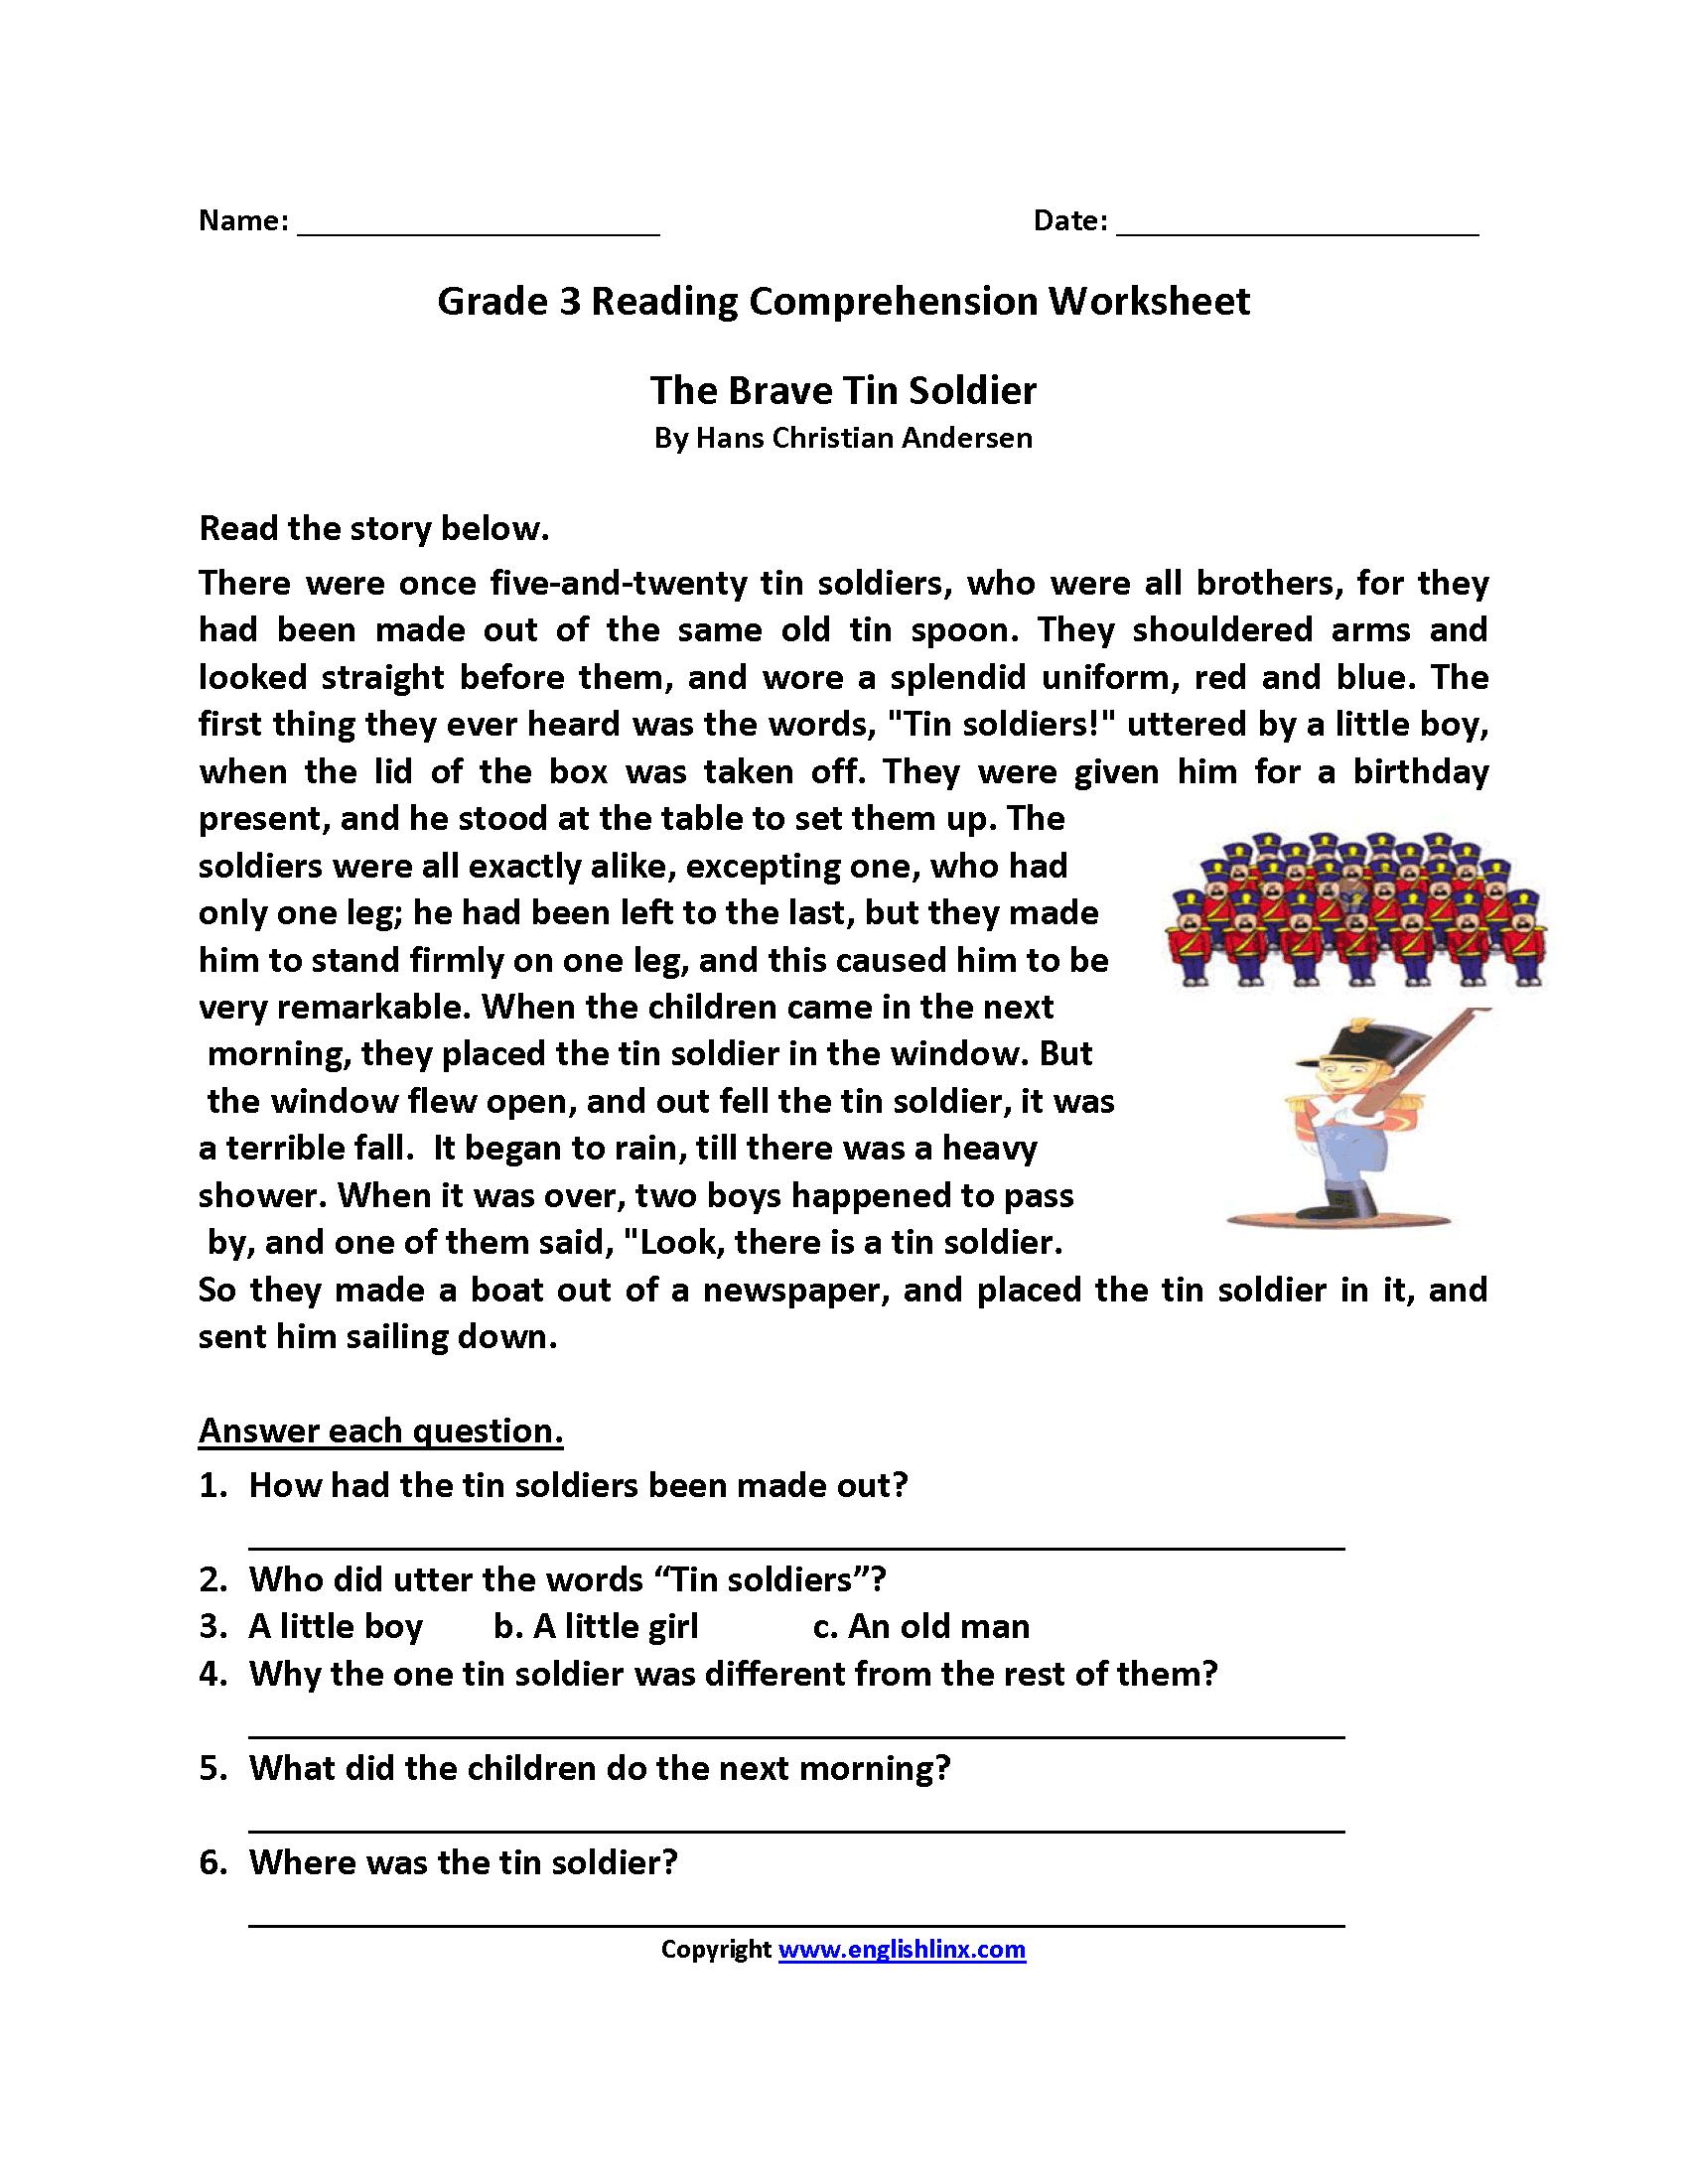 Free Printable Reading Comprehension Worksheets 3Rd Grade For Free | Free Printable 3Rd Grade Reading Worksheets